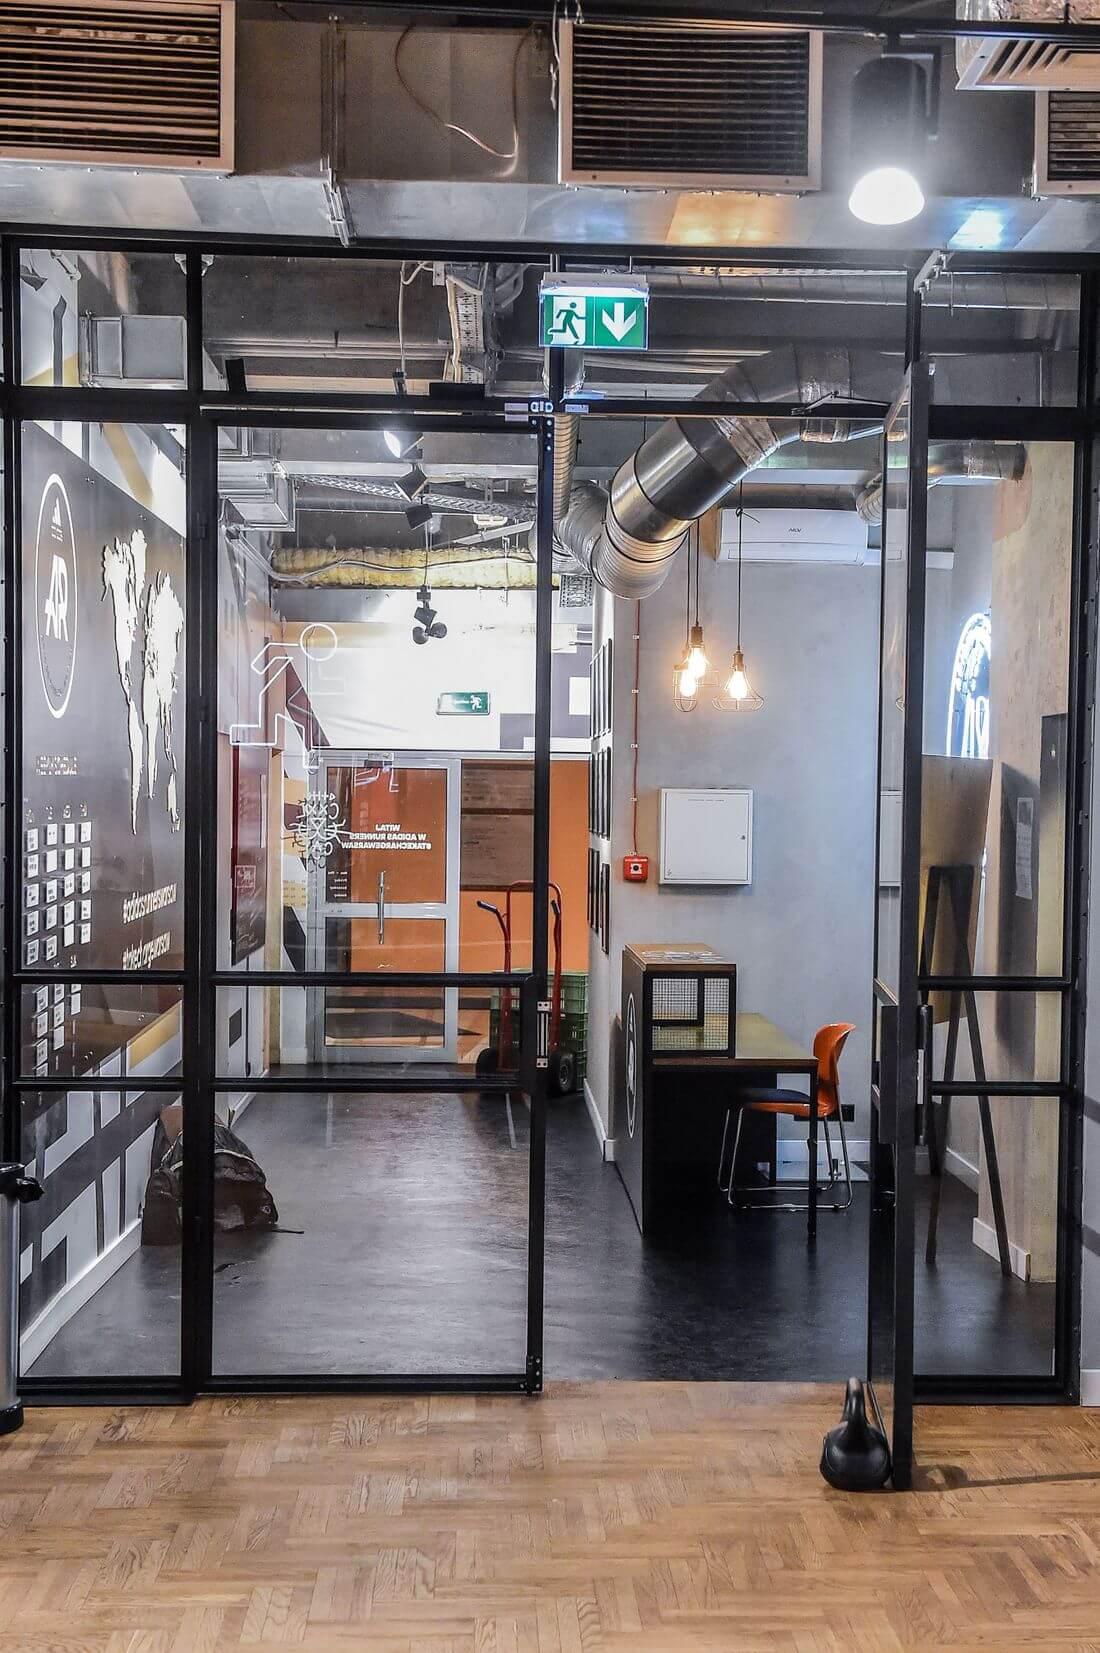 Loft Doors and Loft Walls Glazed Black Metal in Adidas Runners Warsaw